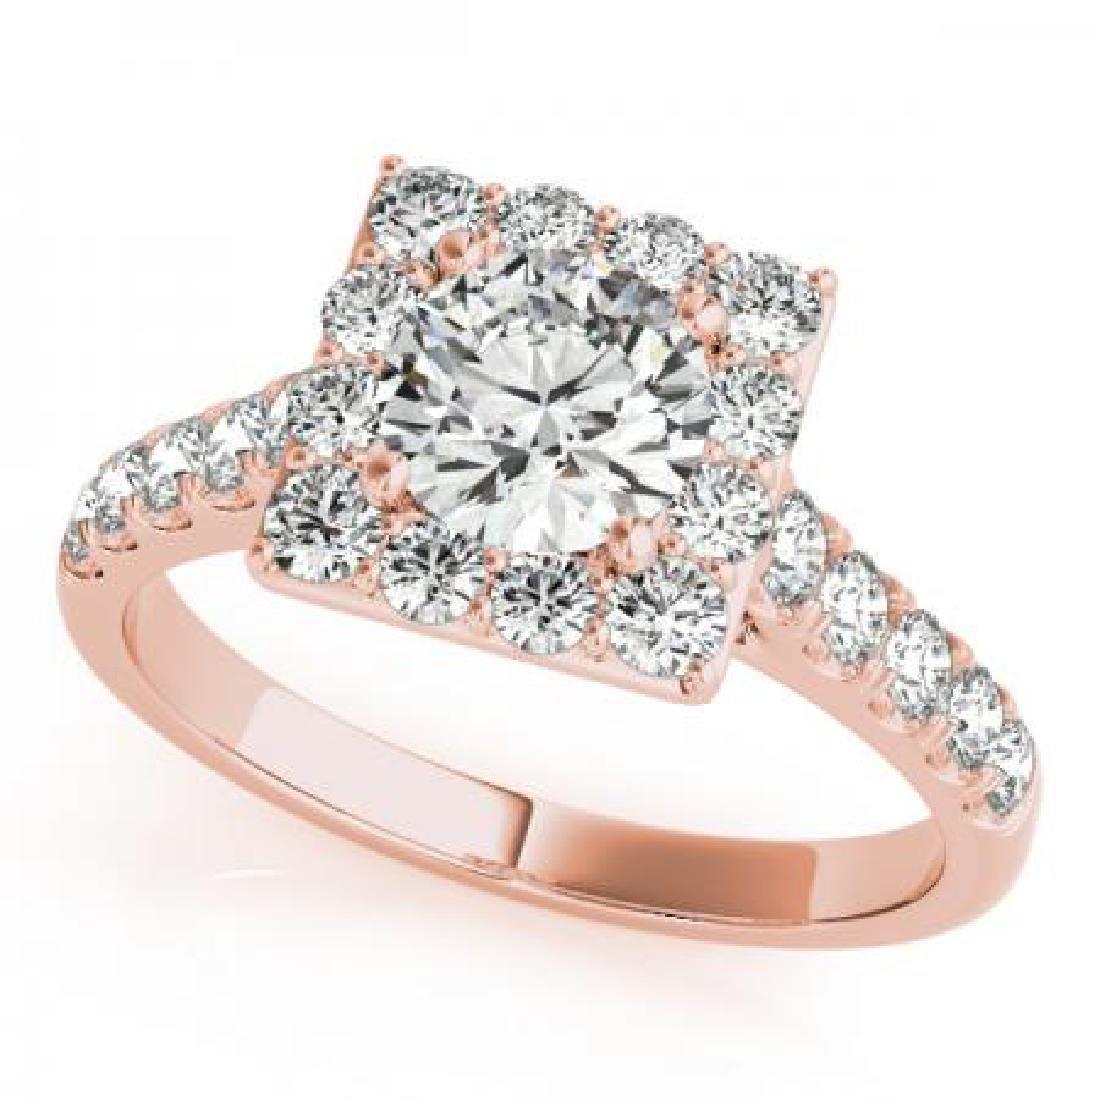 CERTIFIED 14KT ROSE GOLD 1.65 CT G-H/VS-SI1 DIAMOND HAL